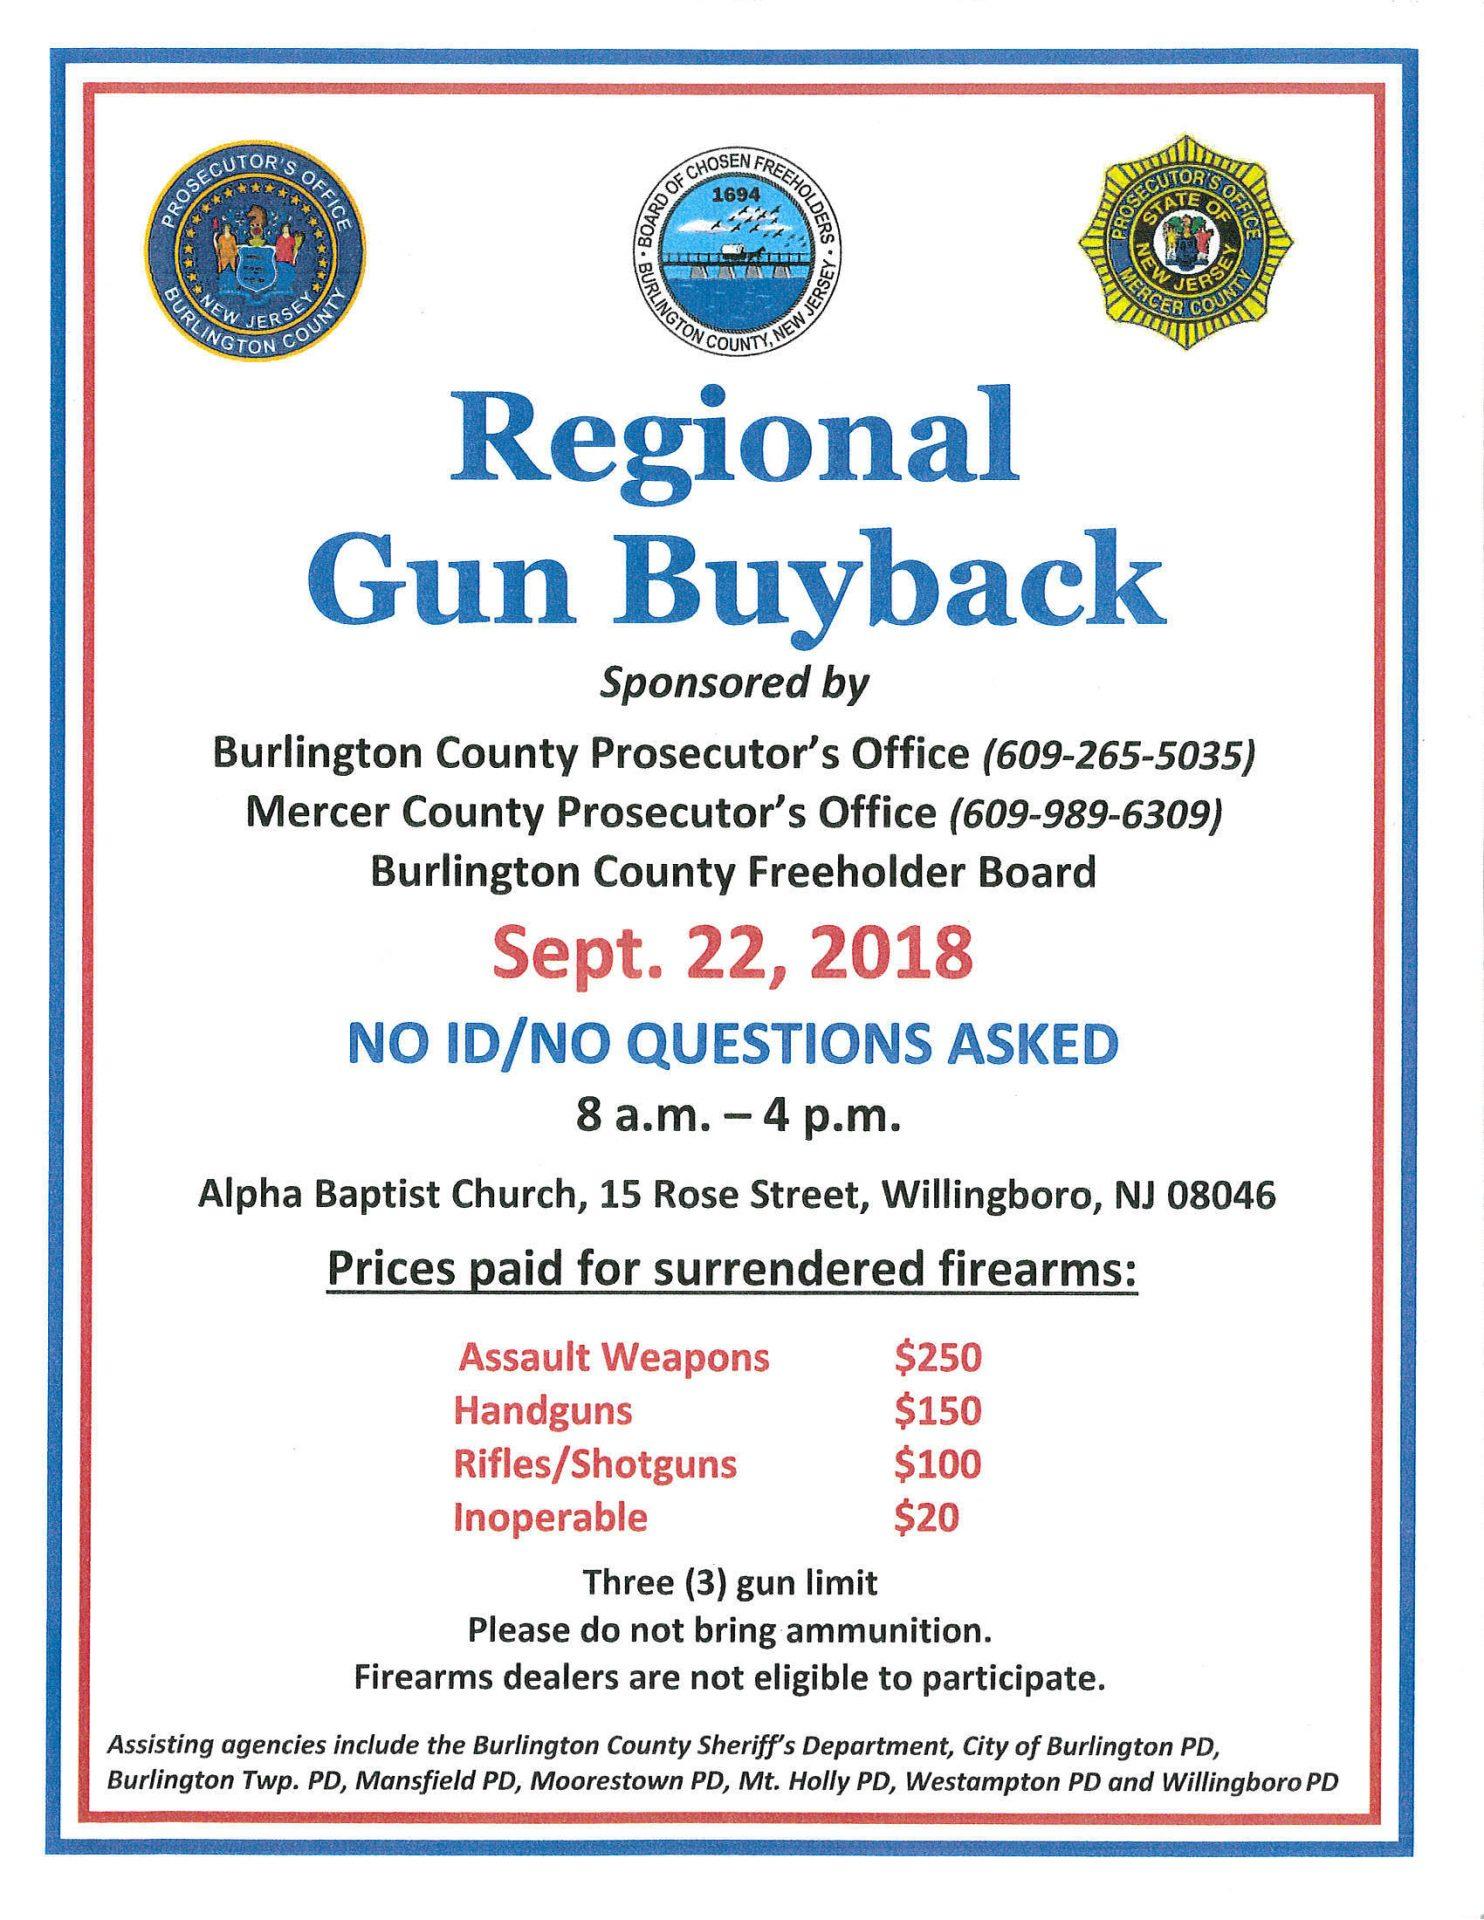 Regional Gun Buyback To Be Held September 22 Mercerme